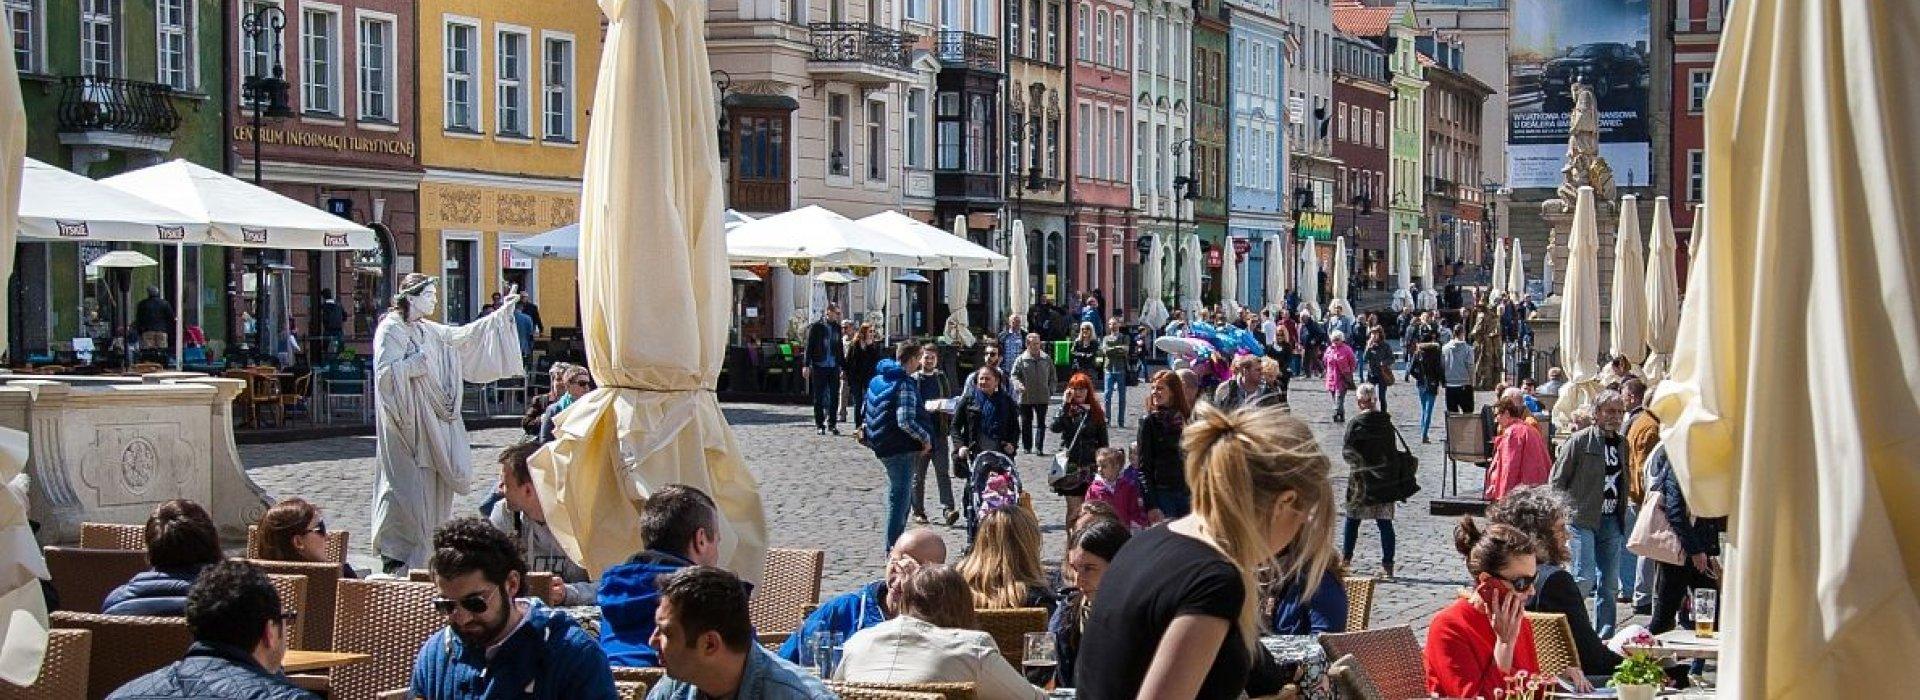 Drinking beer in nice atmosphere of  Old Town in Warsaw